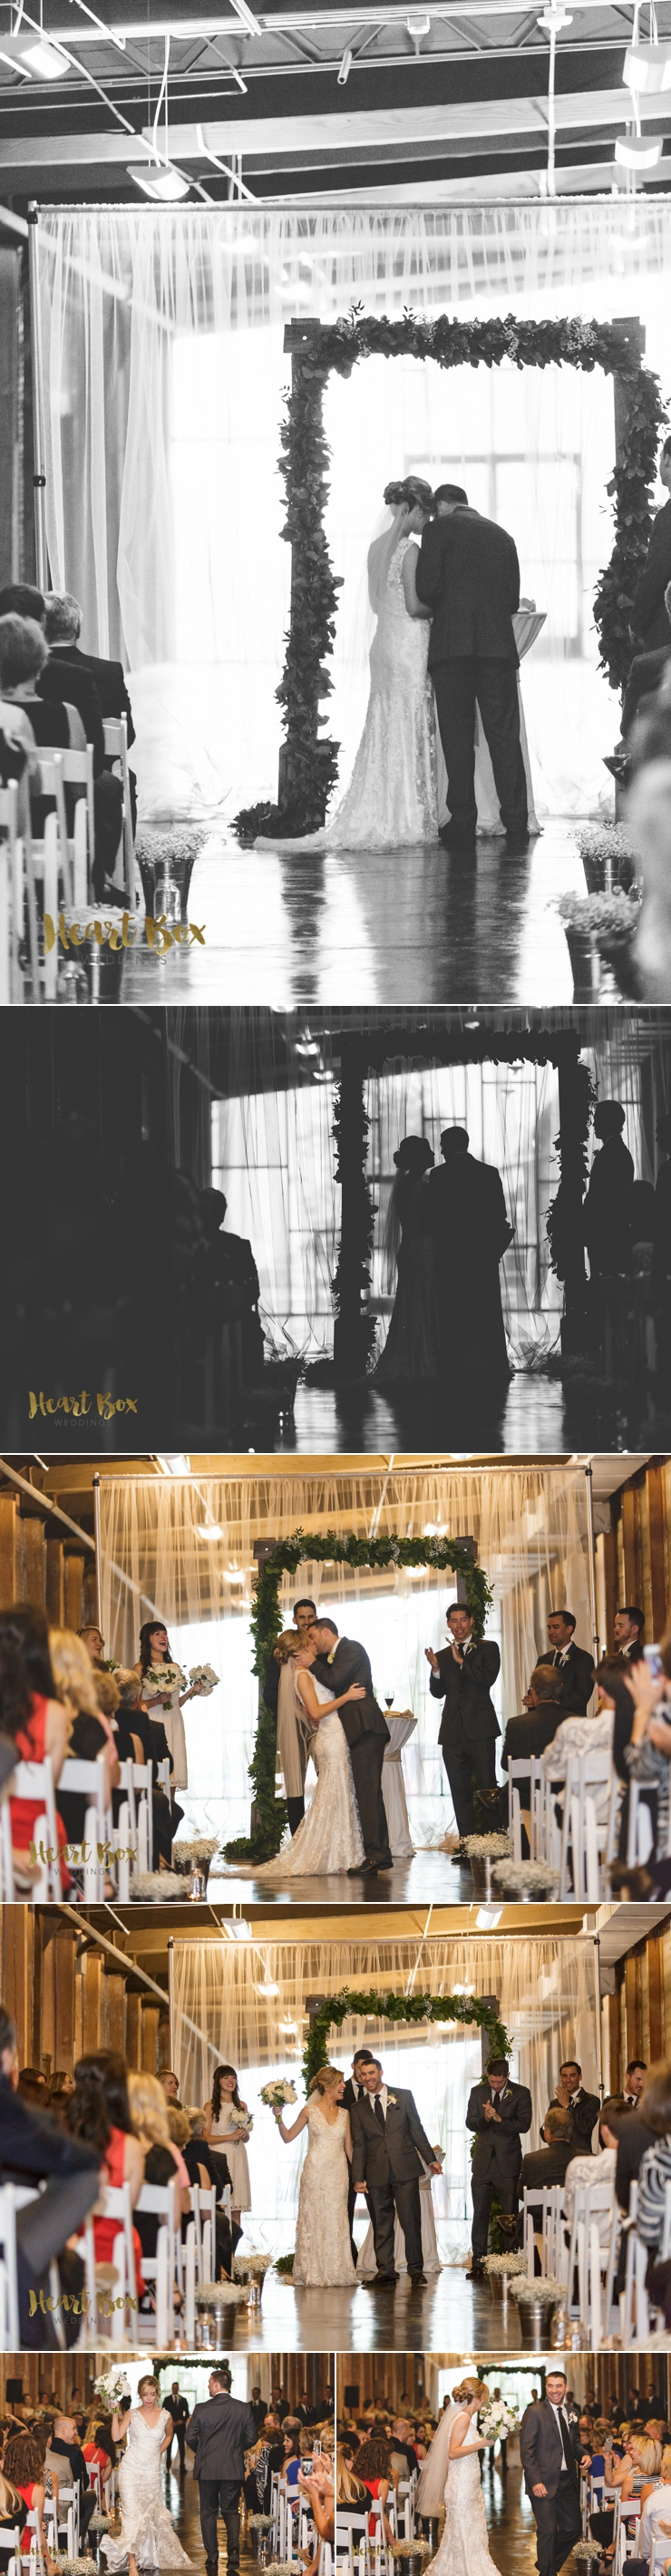 Popplewell Wedding Blog Collages 20.jpg